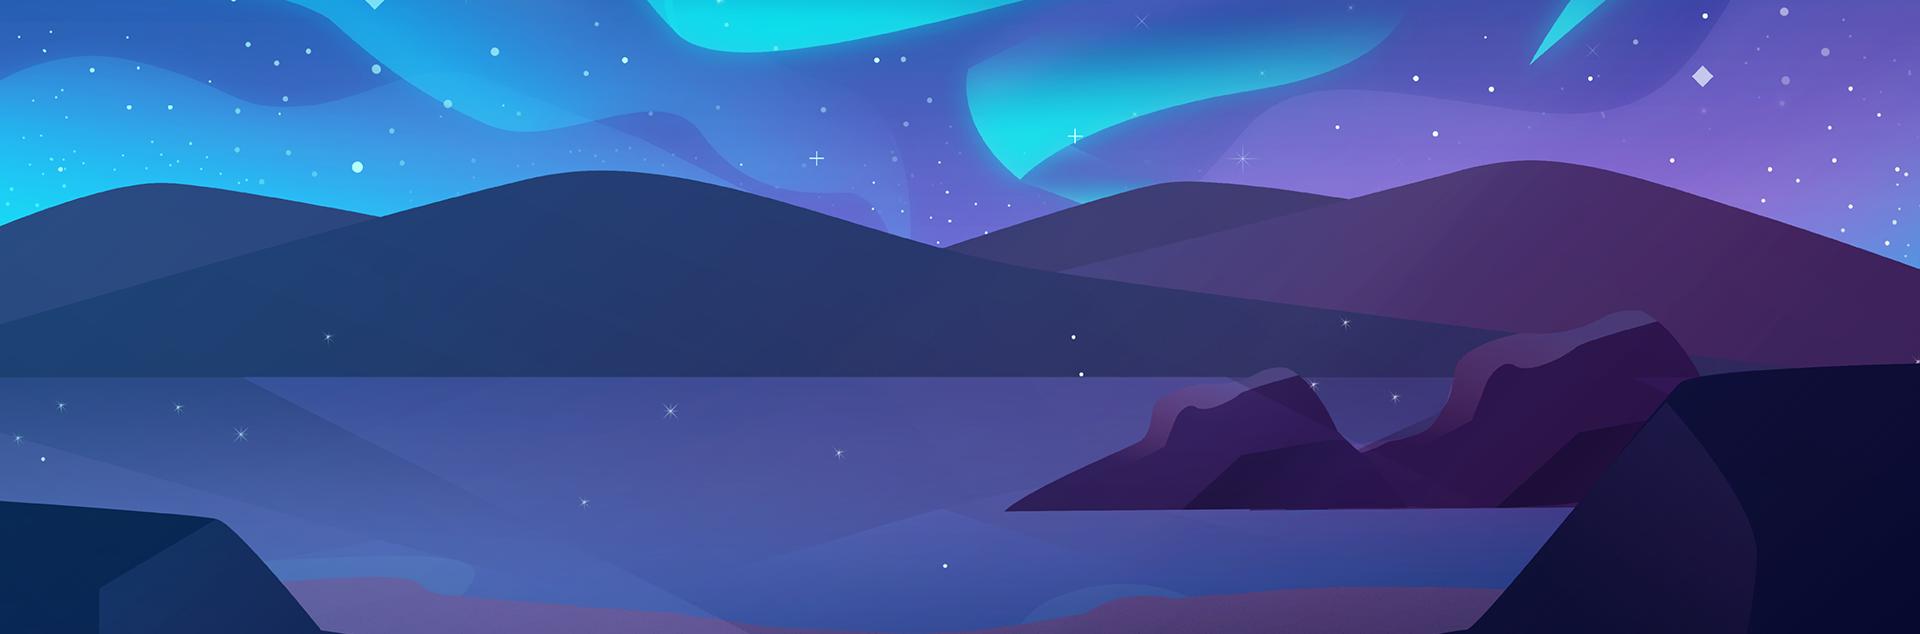 background-inicio